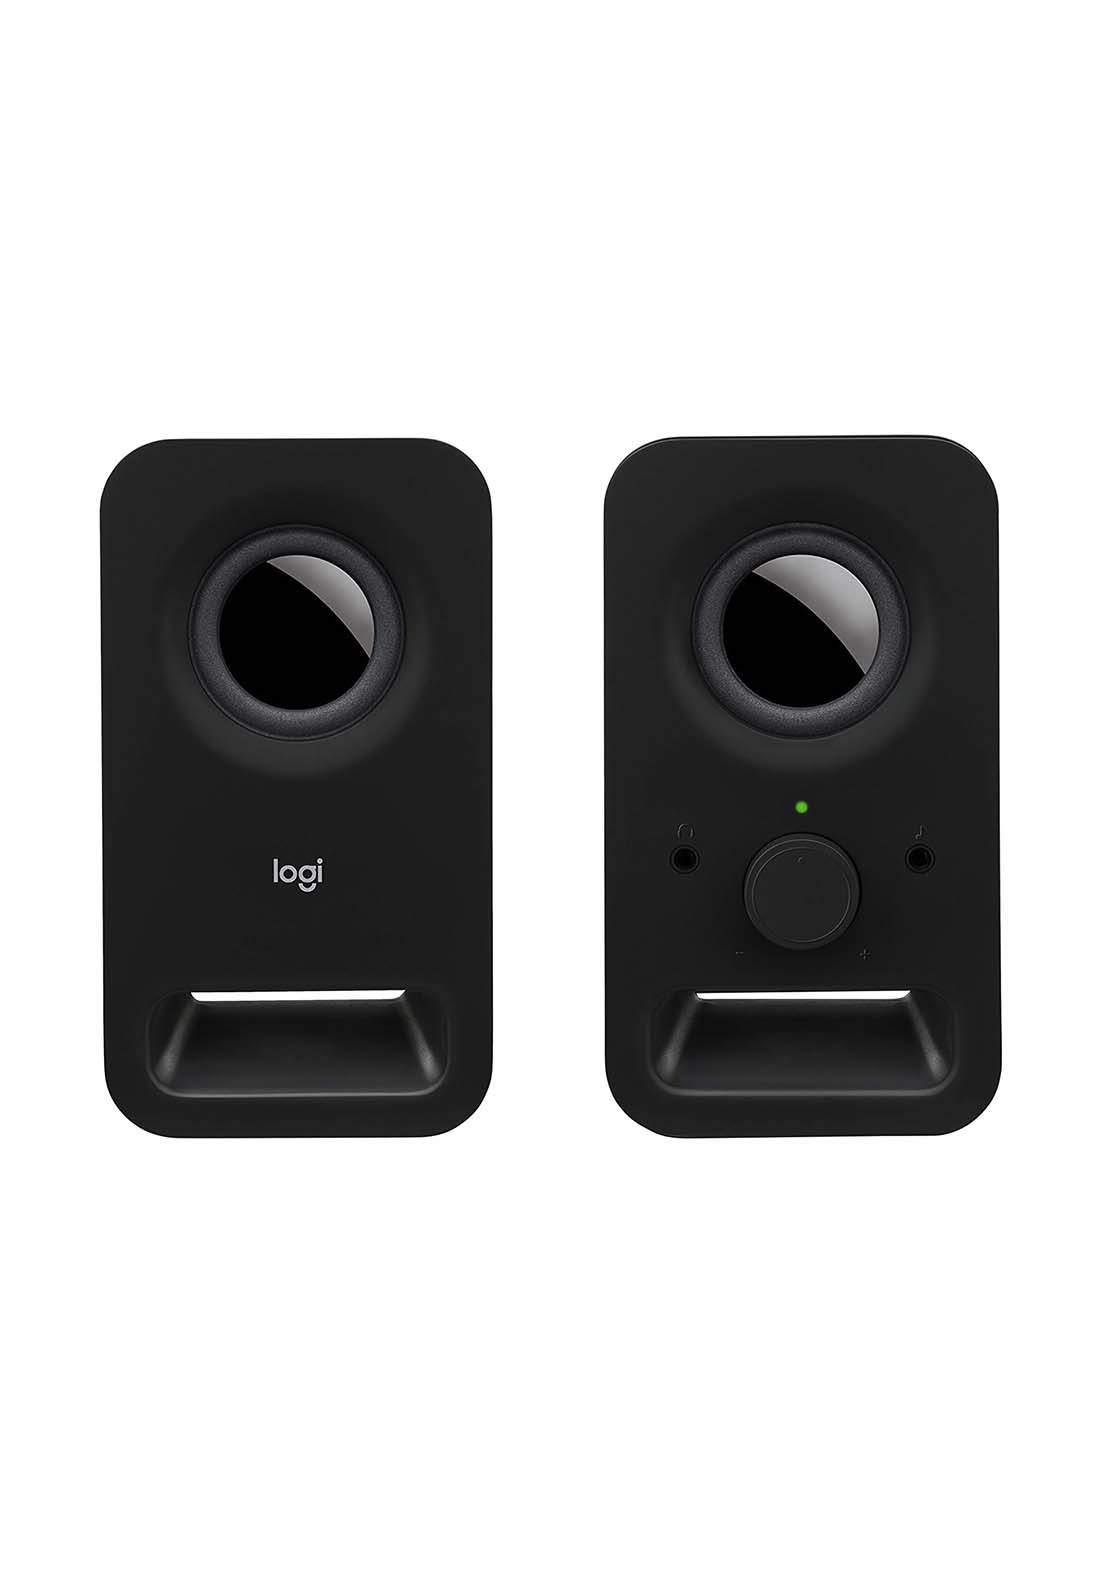 Logitech Z150 Multimedia Speakers with Stereo Sound for Multiple Devices  - Black سبيكر